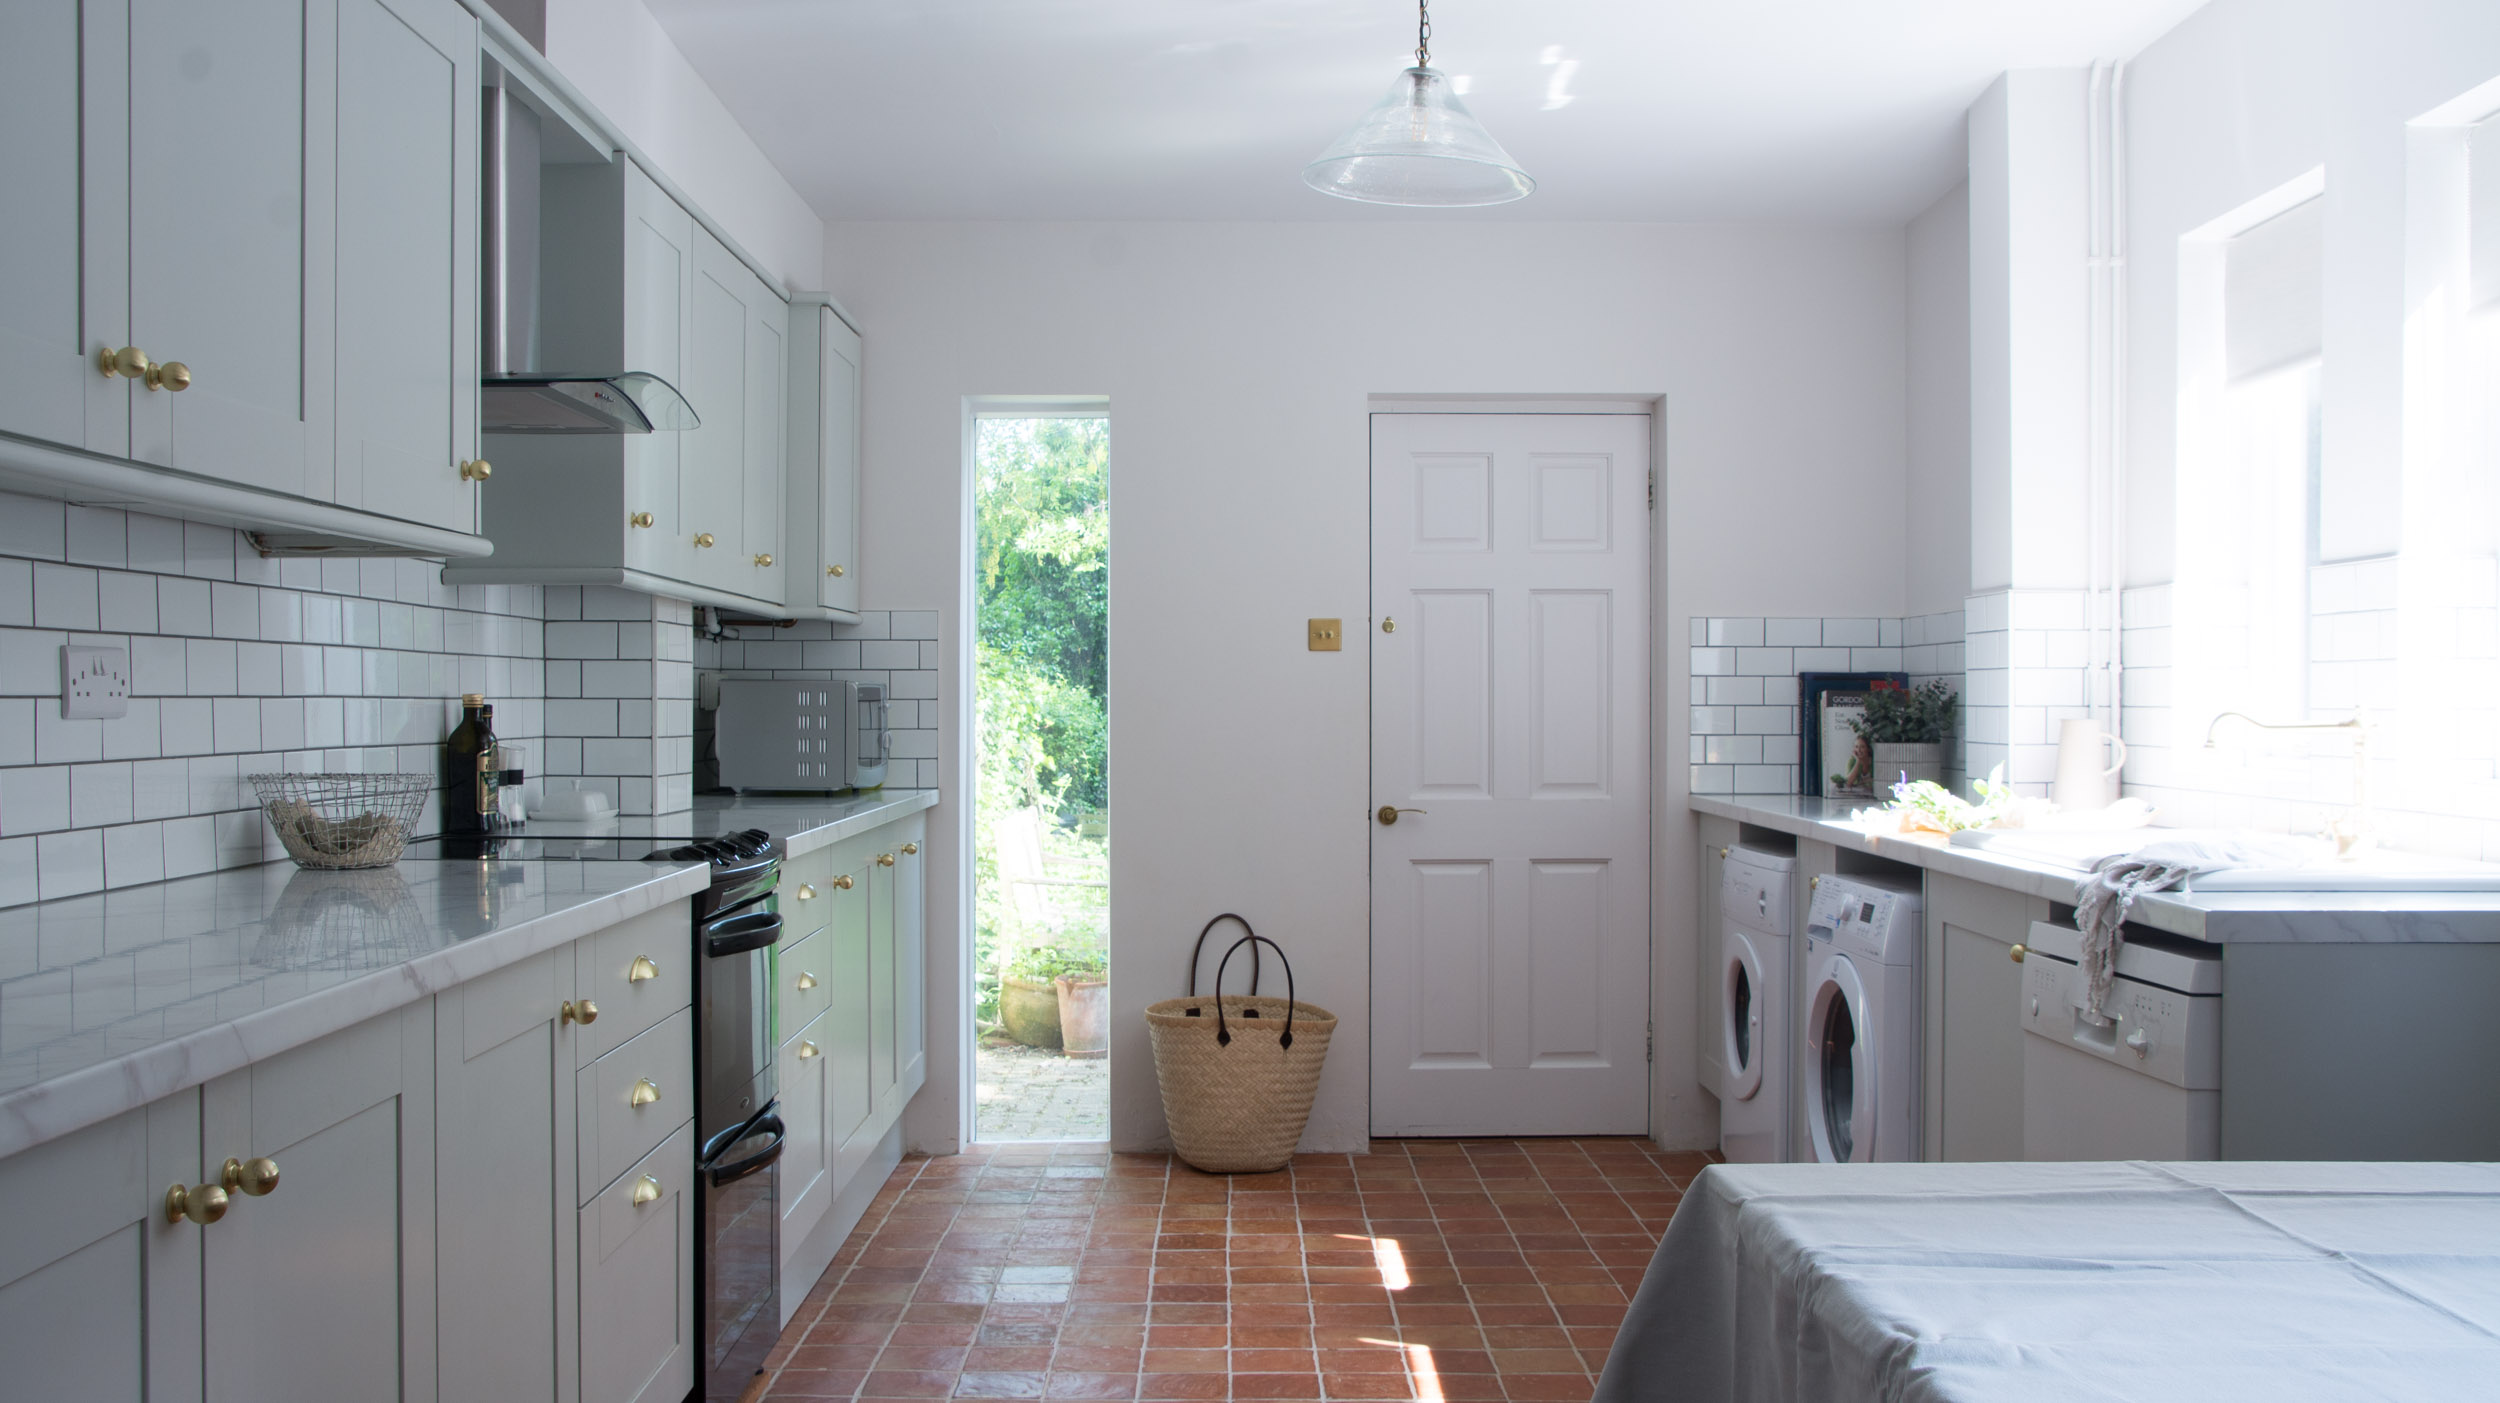 parsons-gray-interior-design-montague-road-1.jpg